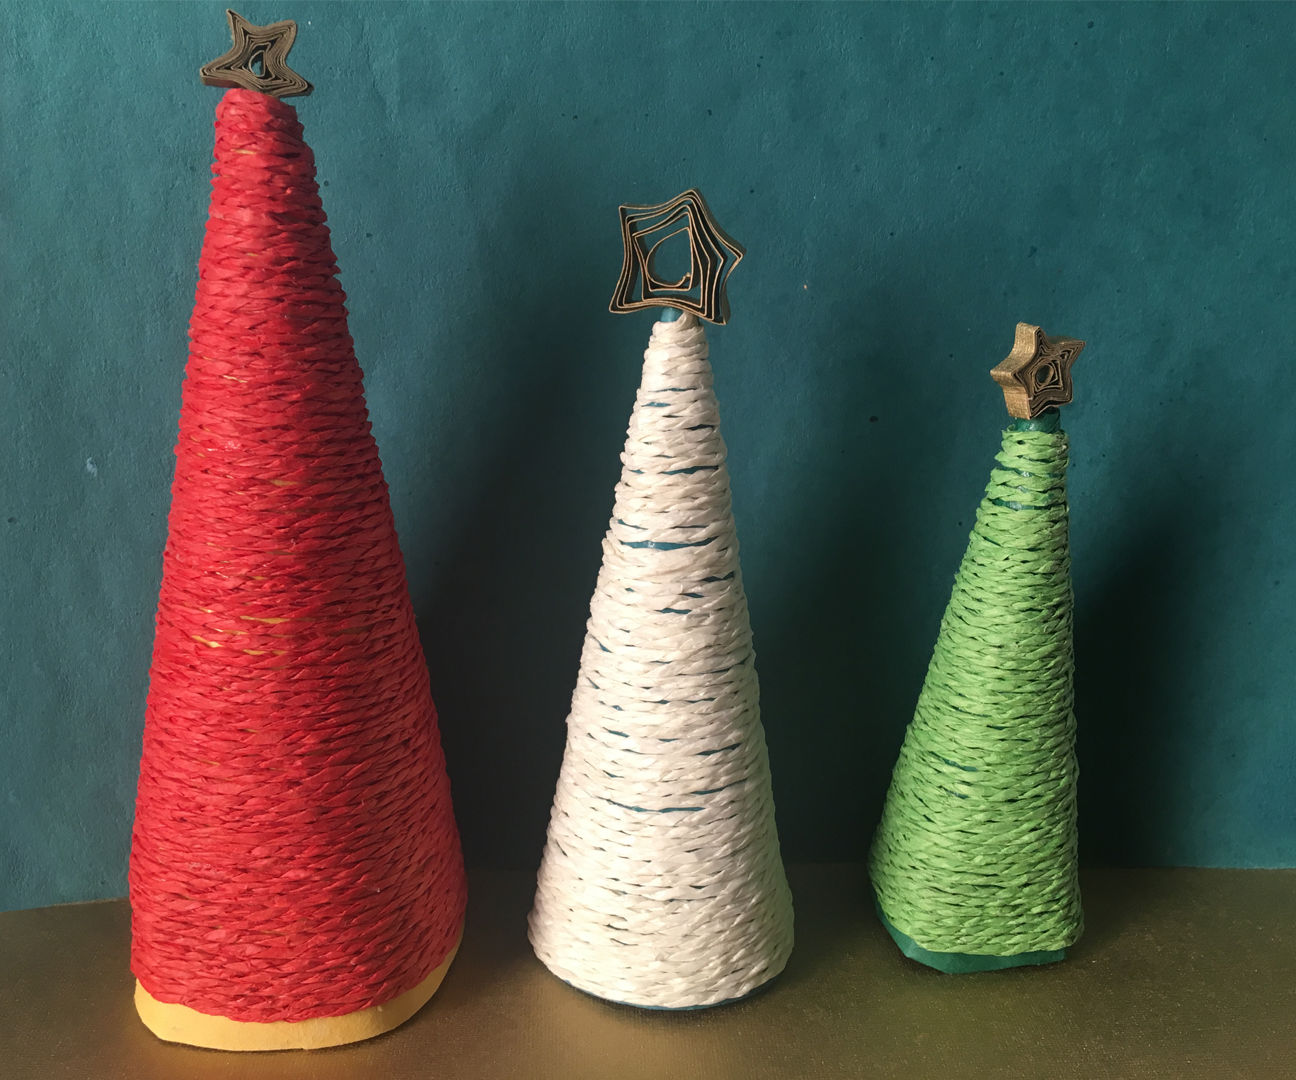 How To Make A Christmas Tree   DIY Miniature Christmas Tree   DIY Christmas Home Decor